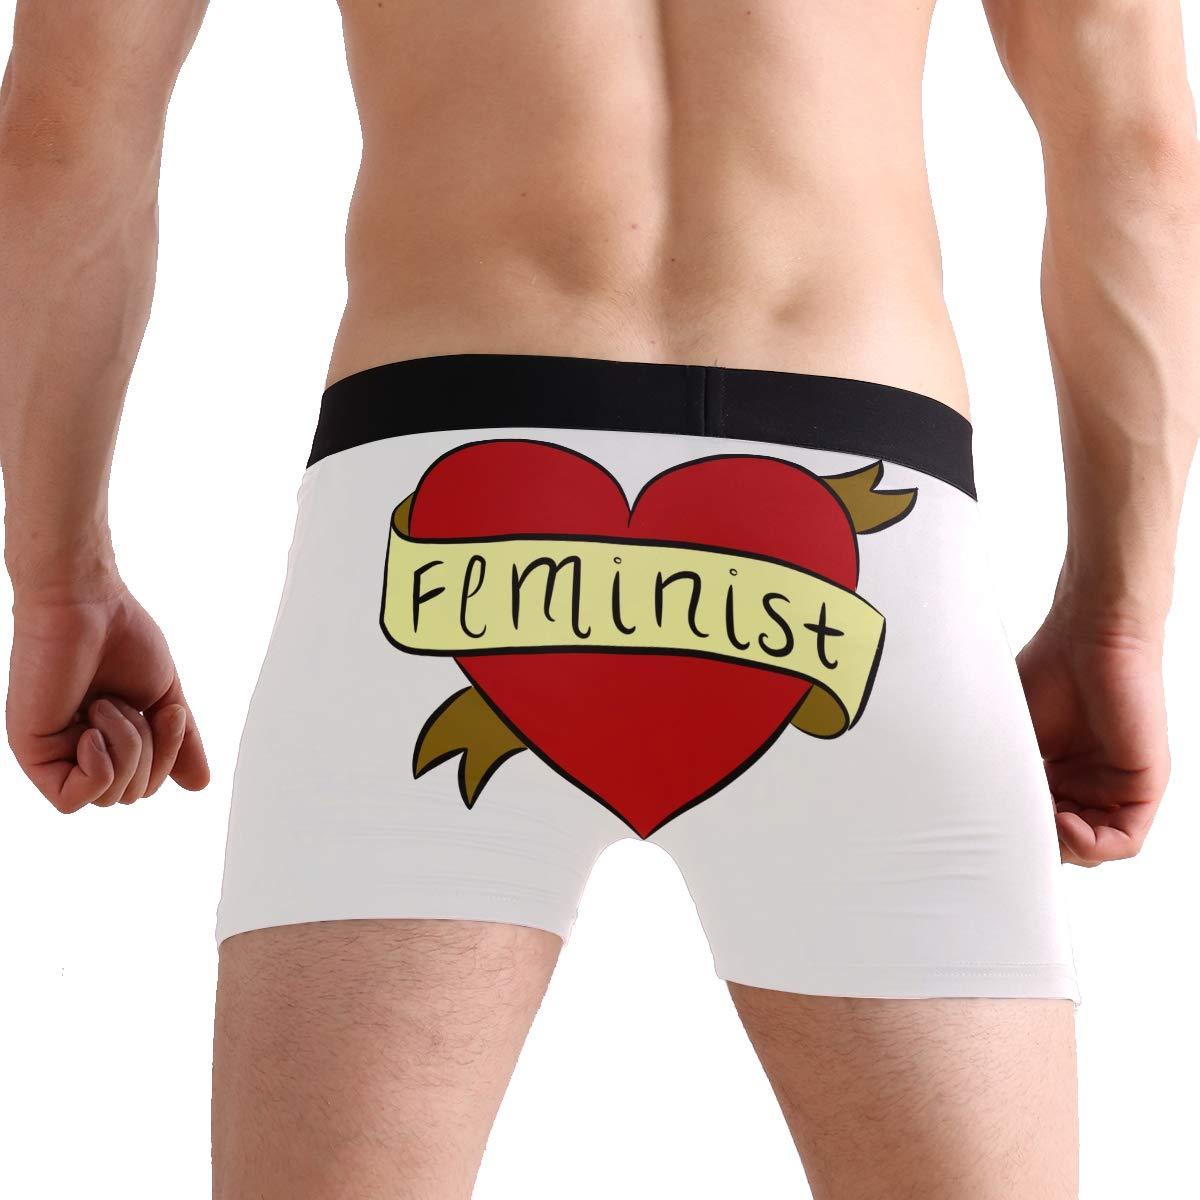 71759322022 Amajun Men s Boy s Feminist Heart Basic Solid Soft Underwear Trunks Boxer  Briefs at Amazon Men s Clothing store